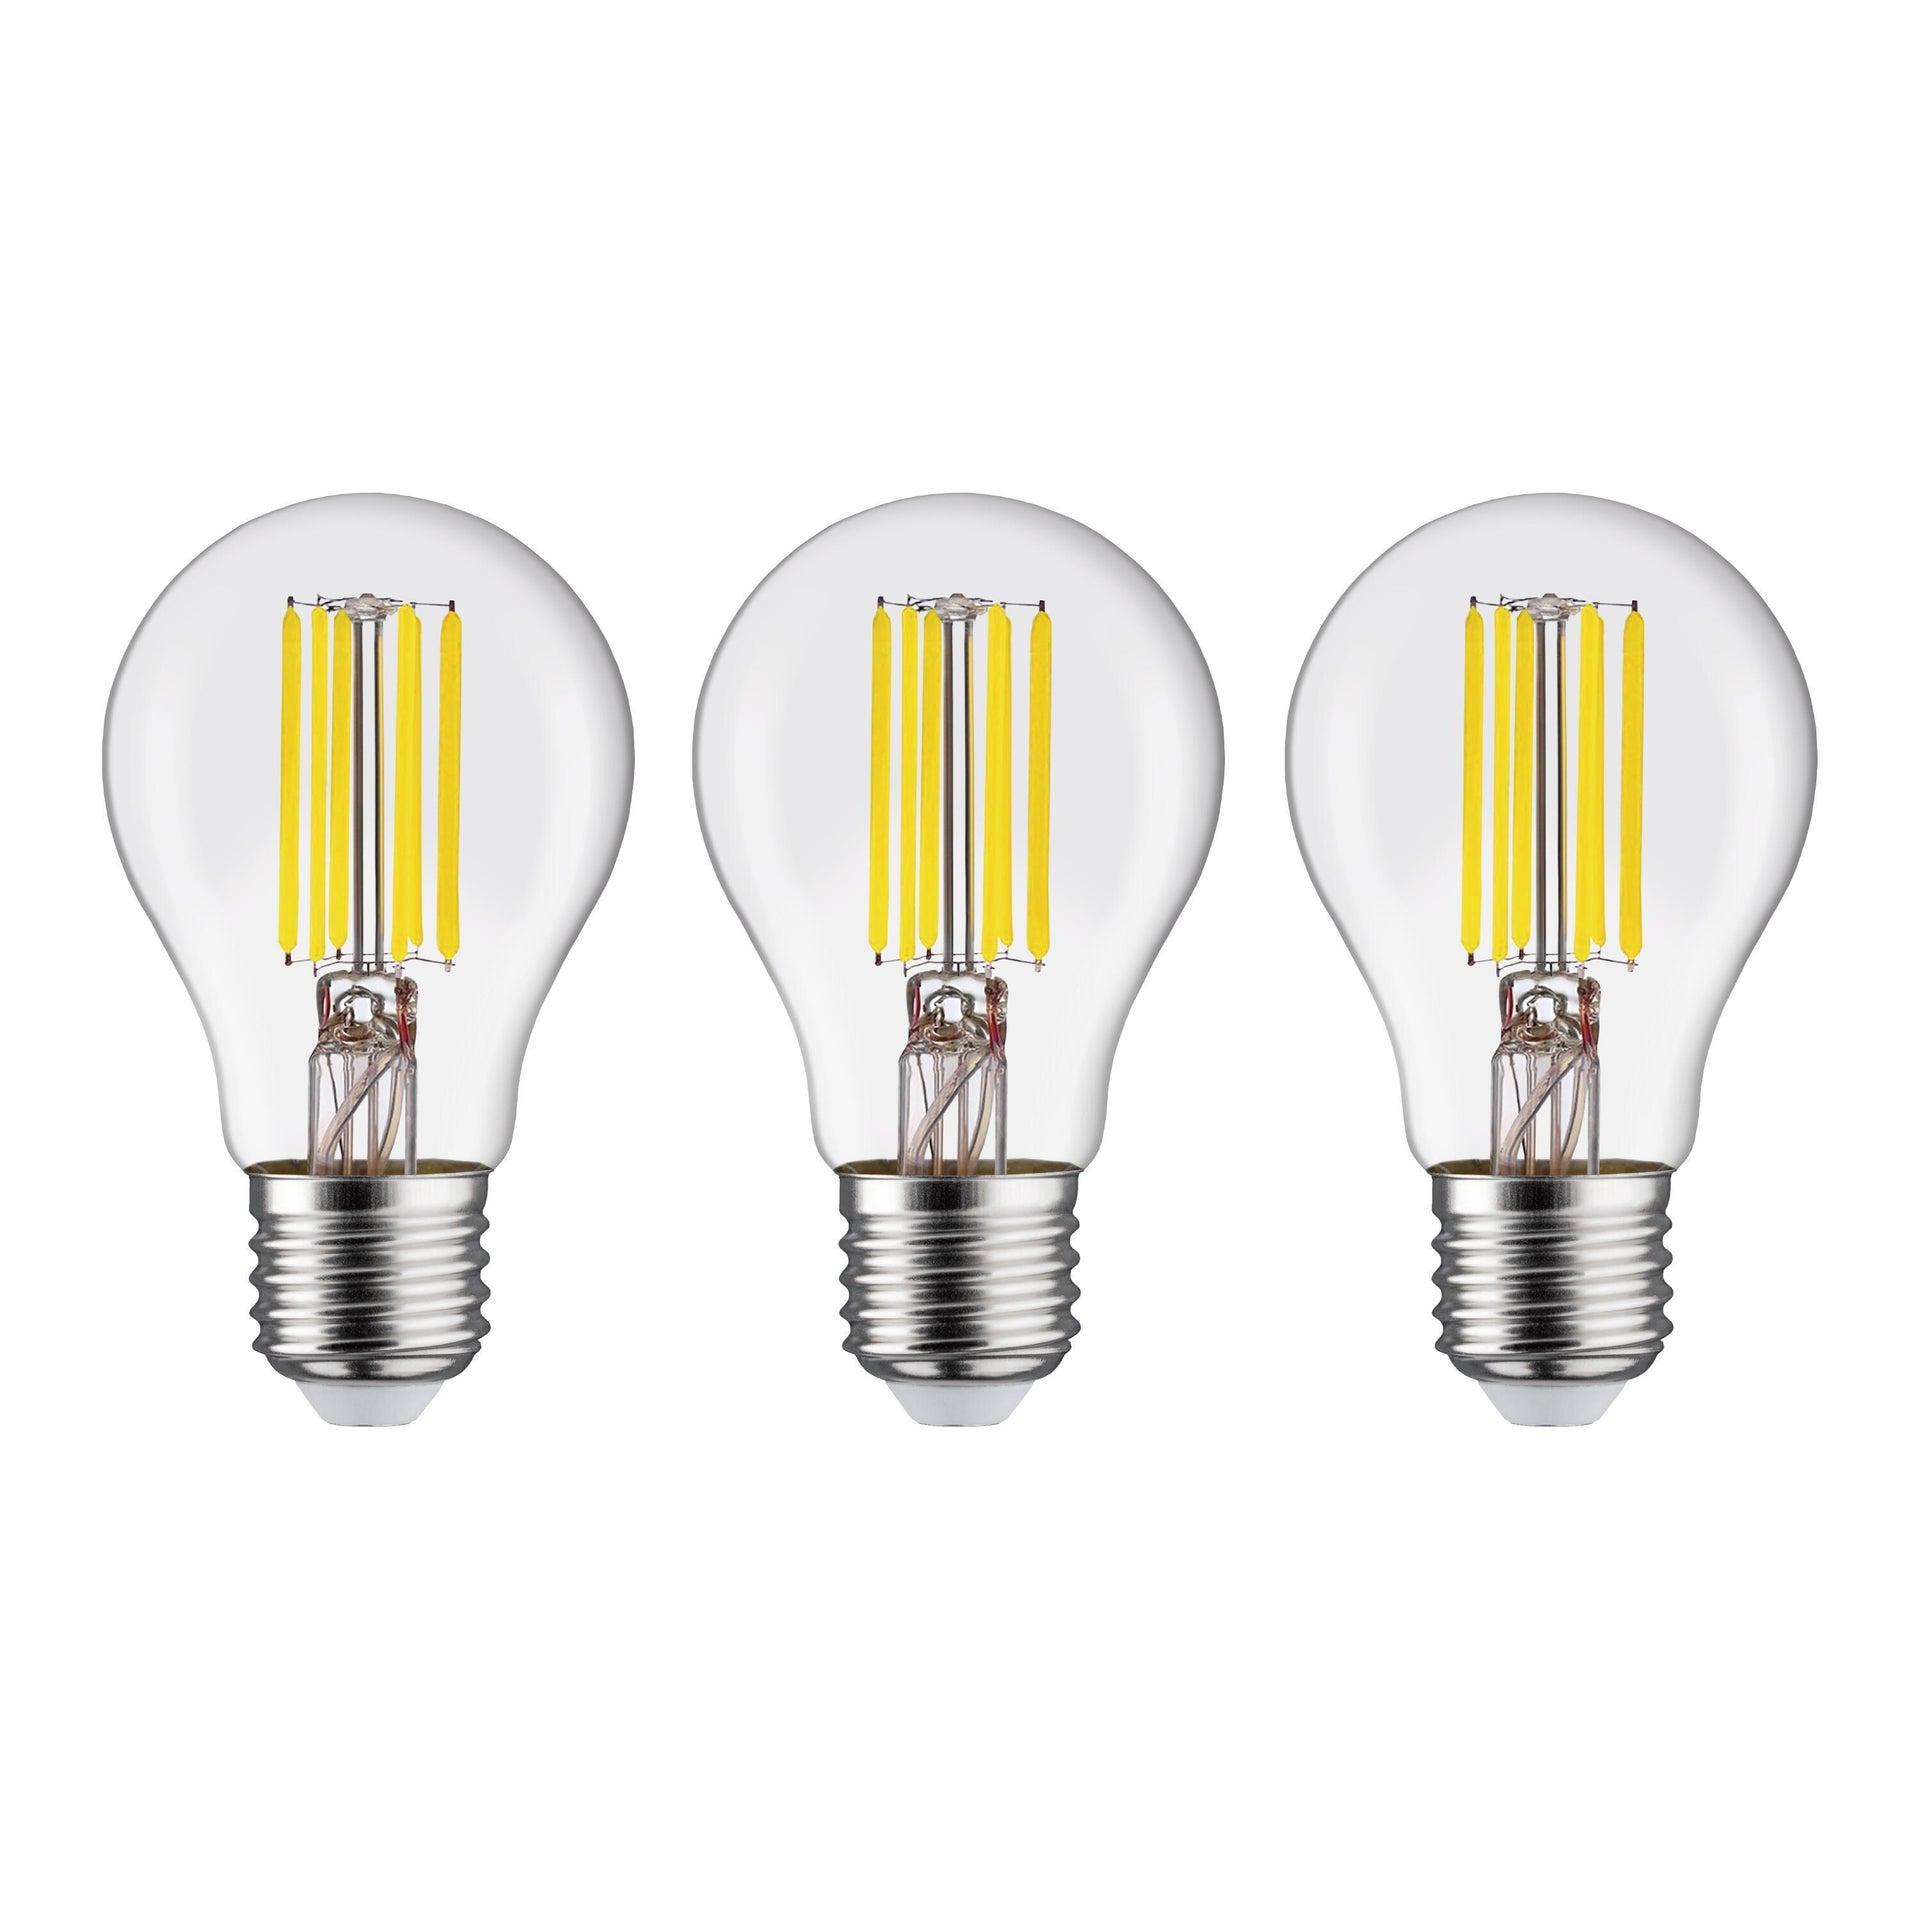 Set di 3 lampadine LED filamento, E27, Goccia, Trasparente, Luce naturale, 12W=1521LM (equiv 100 W), 360° , LEXMAN - 1